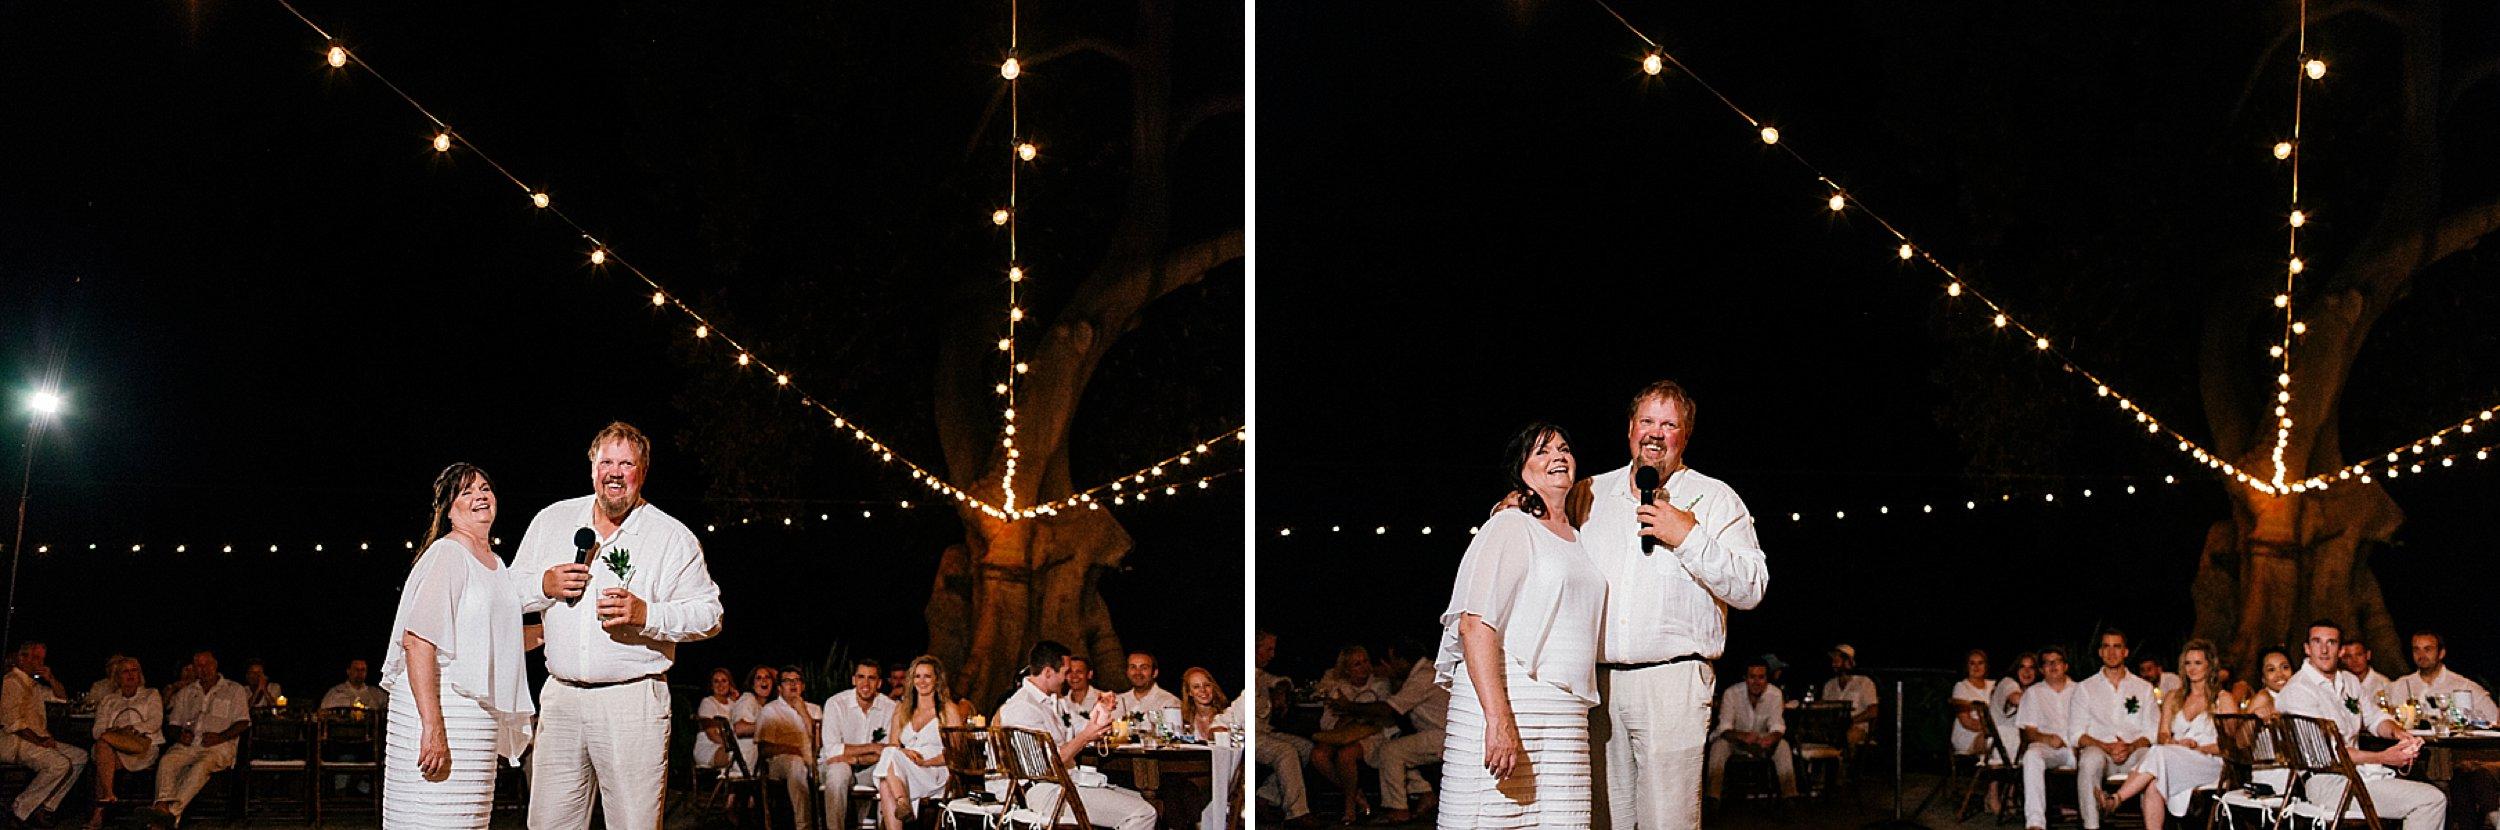 maui-wedding-at-olowalu-plantation-house_0124.jpg